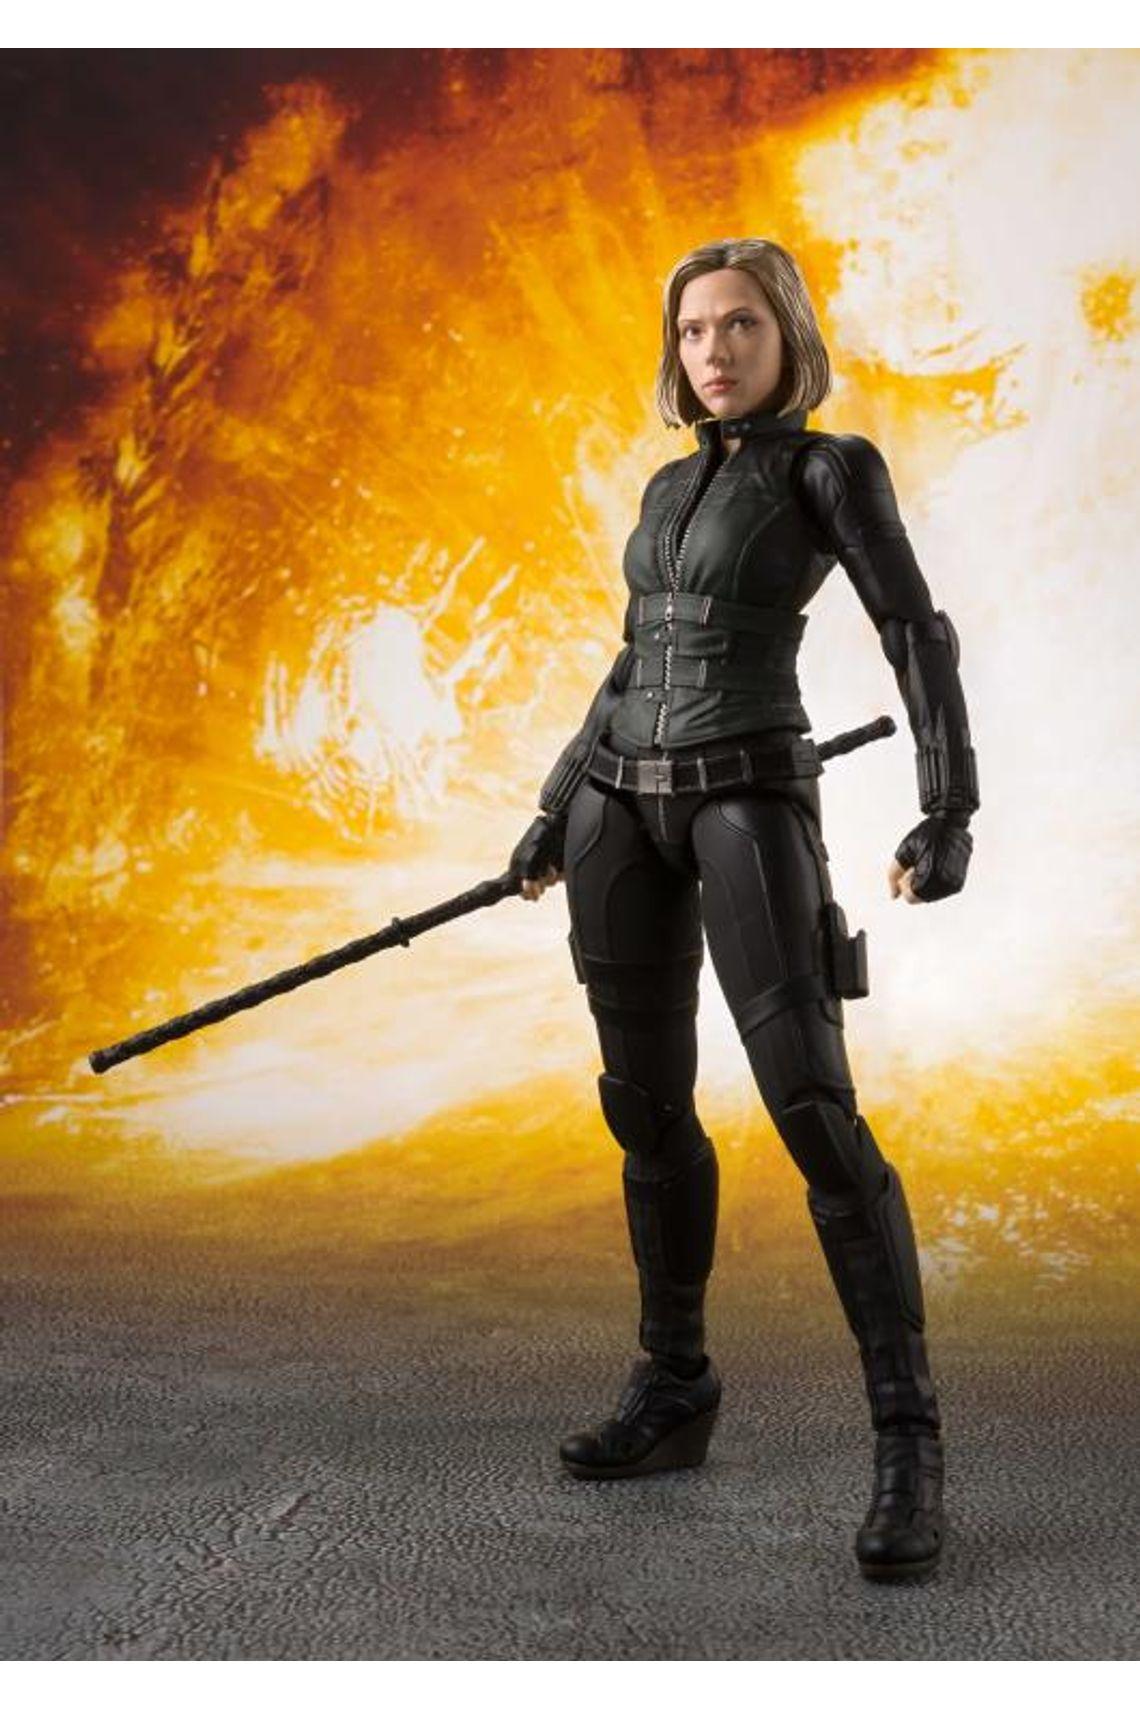 Collectible by Natasha Romanoff, the Black Widow.